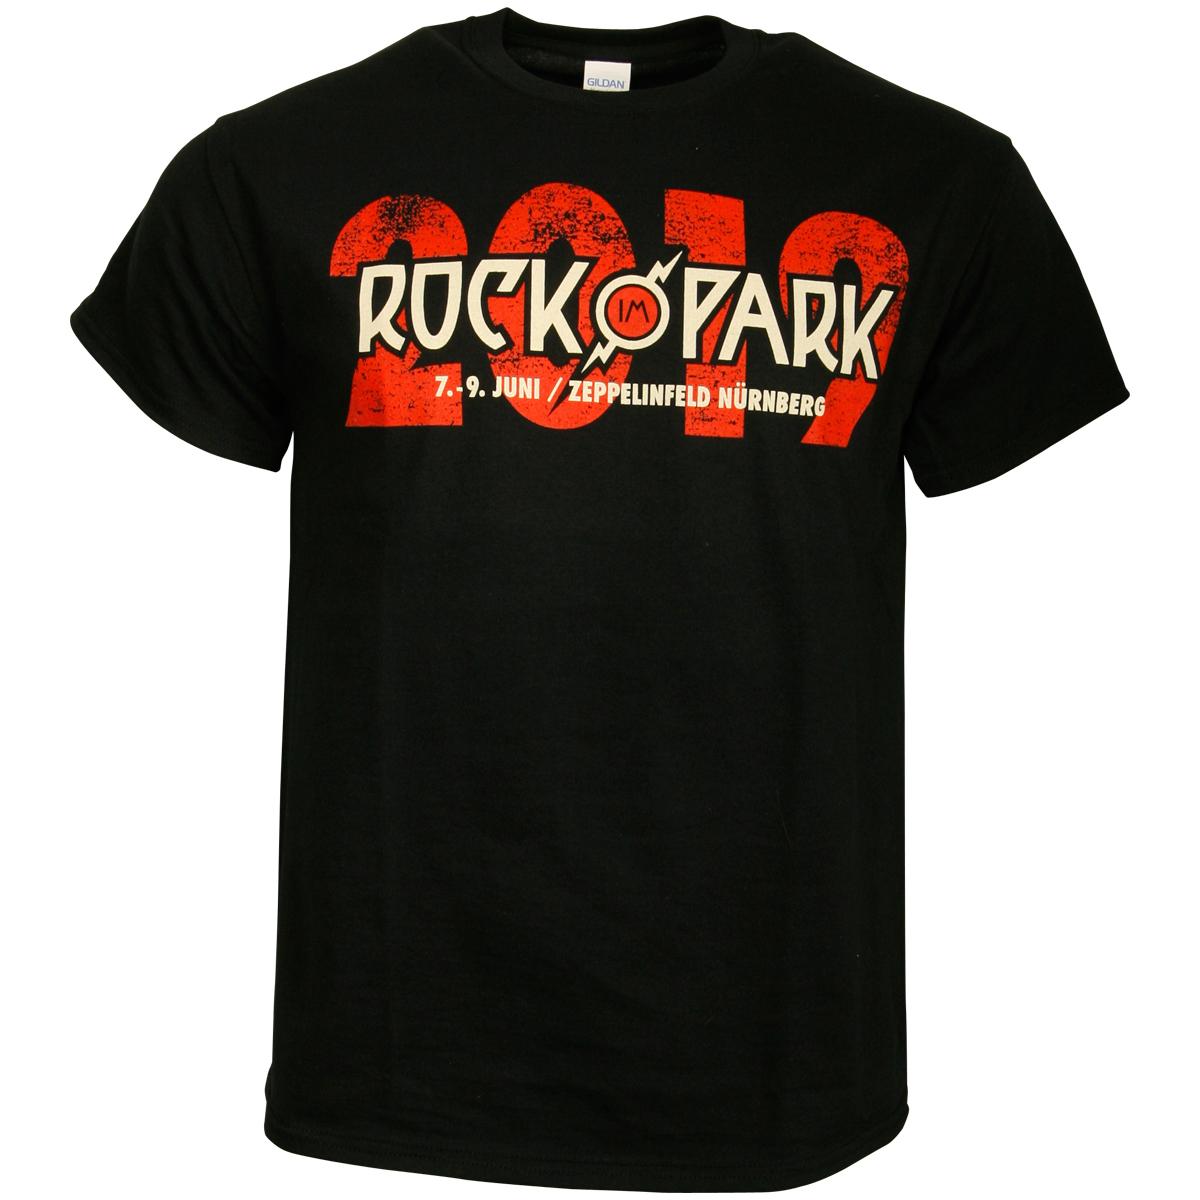 Rock im Park 2019 - T-Shirt Festival - schwarz